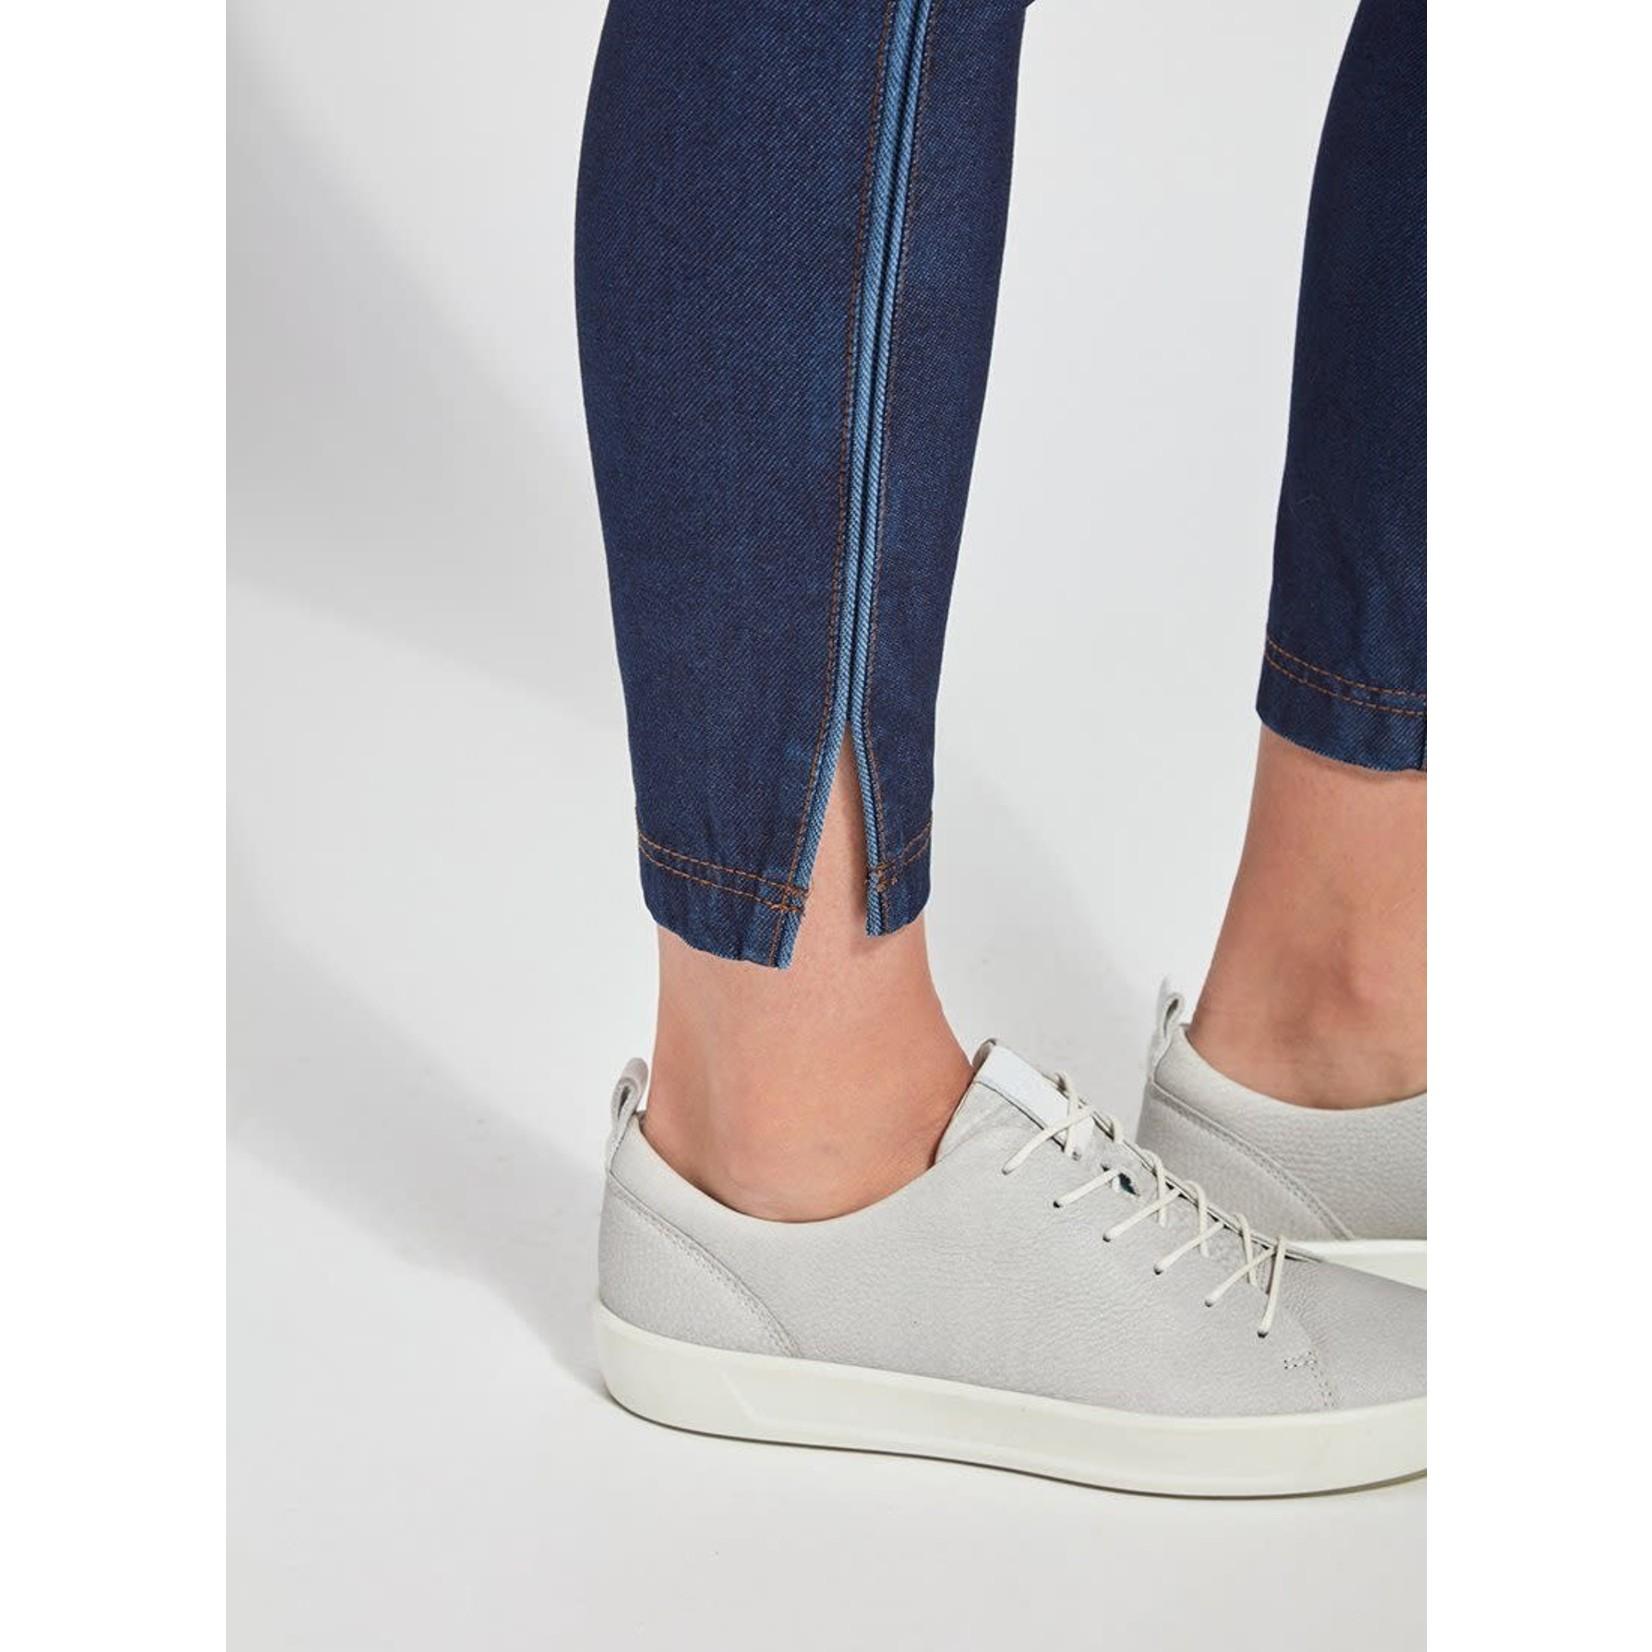 Park Legging w/ Side Ankle Slits - Indigo